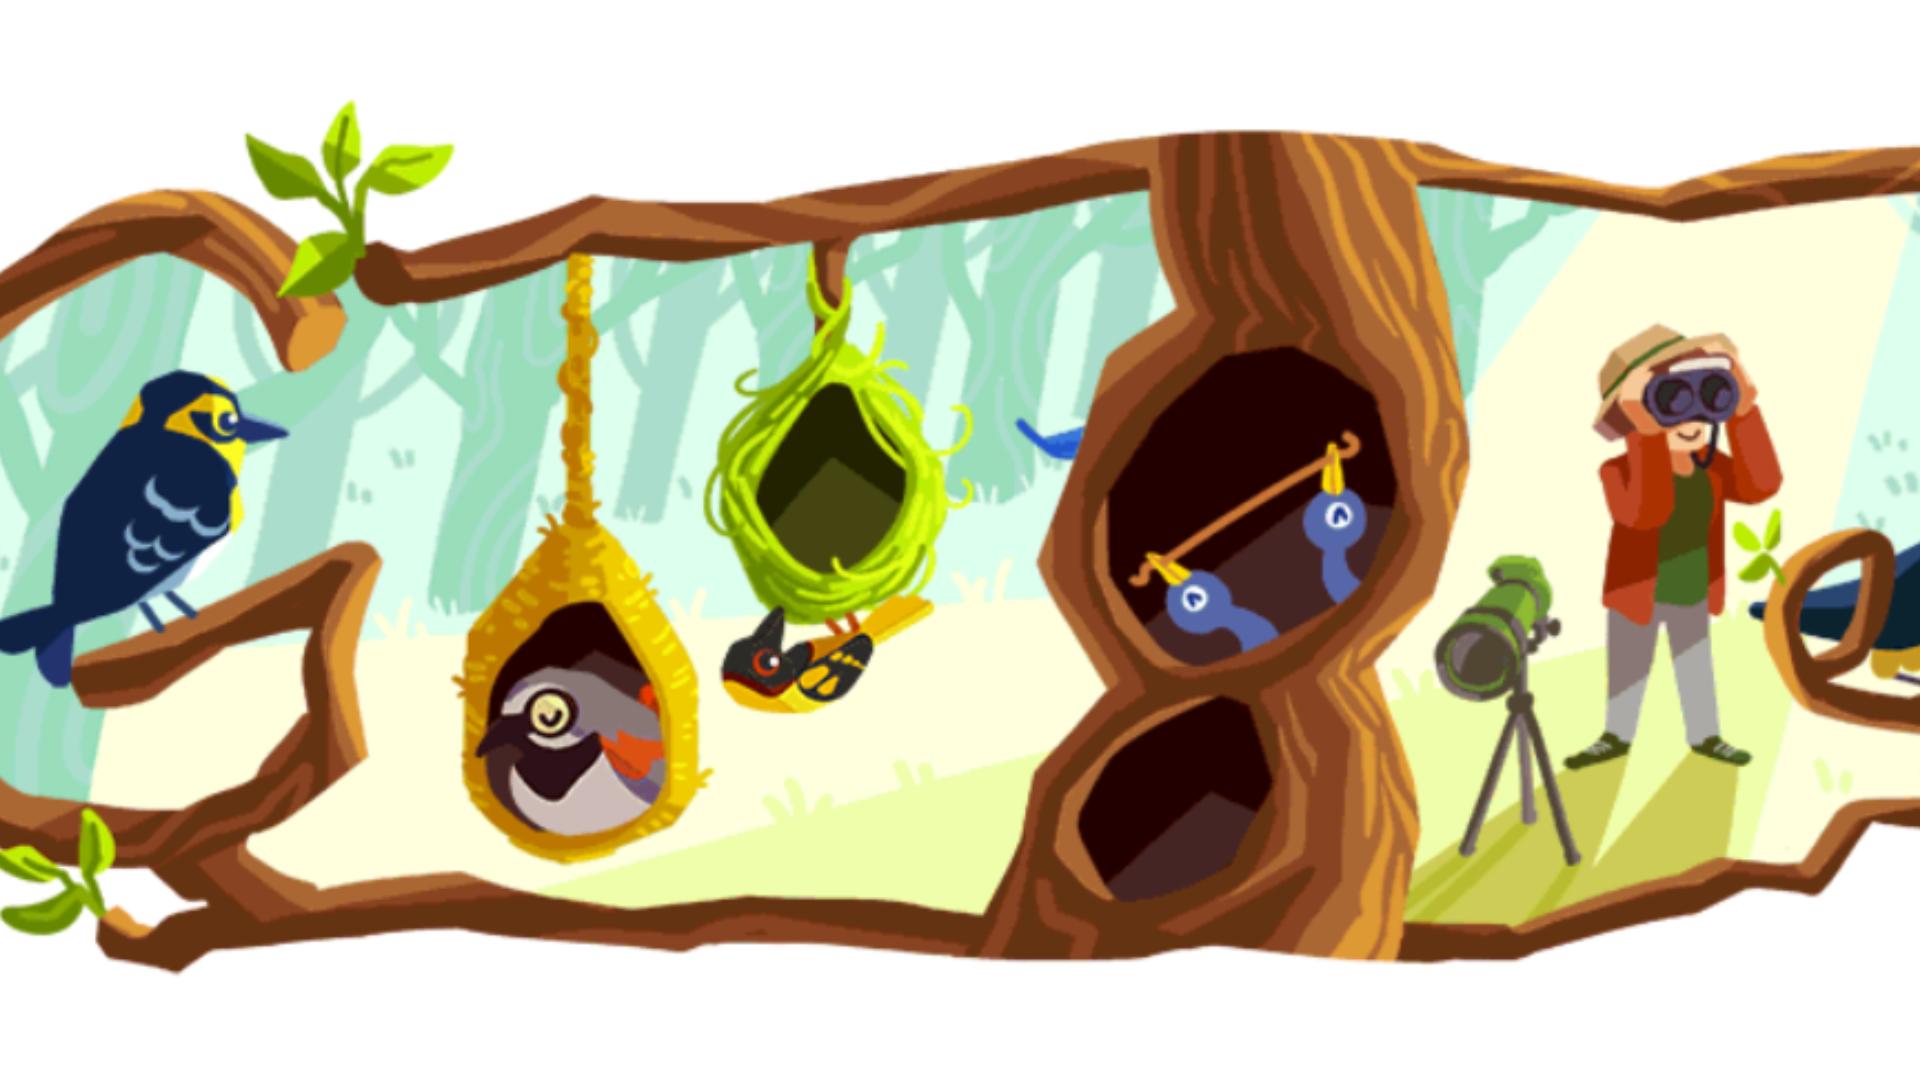 Phoebe-snetsingers google doodle